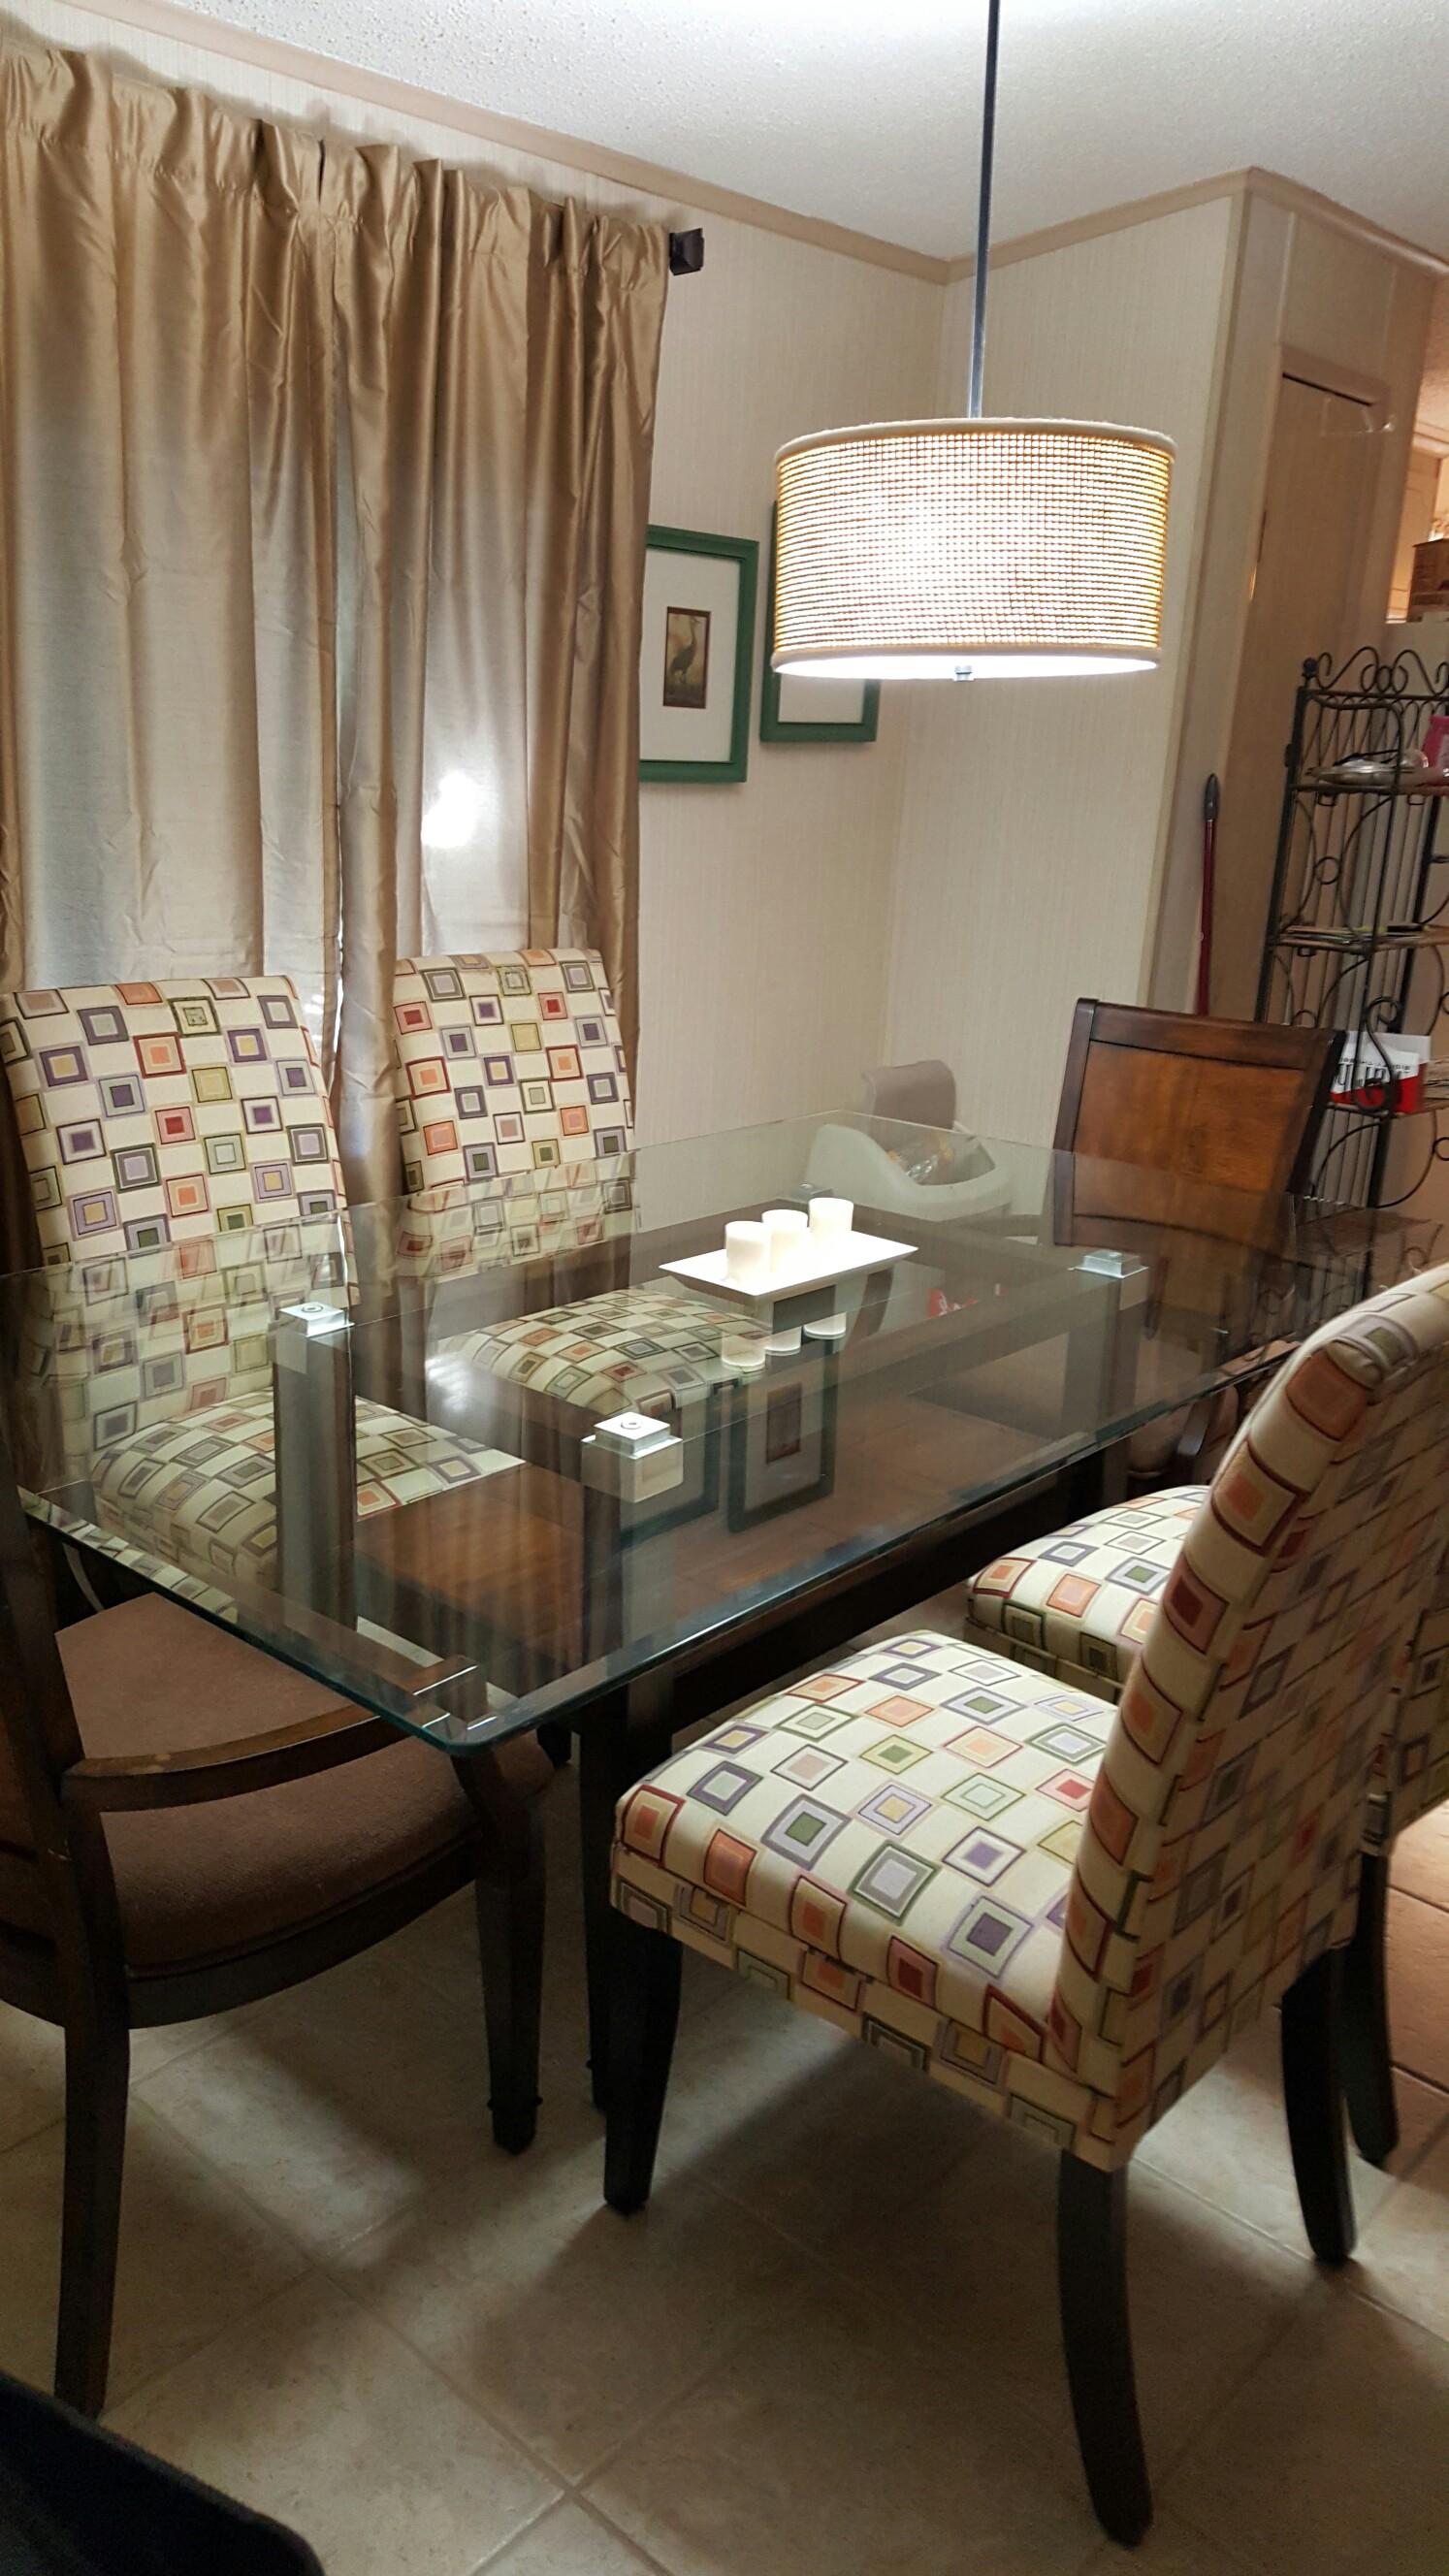 Genial Design Furniture Consignment 5314 S Florida Ave, Lakeland, FL 33813   YP.com